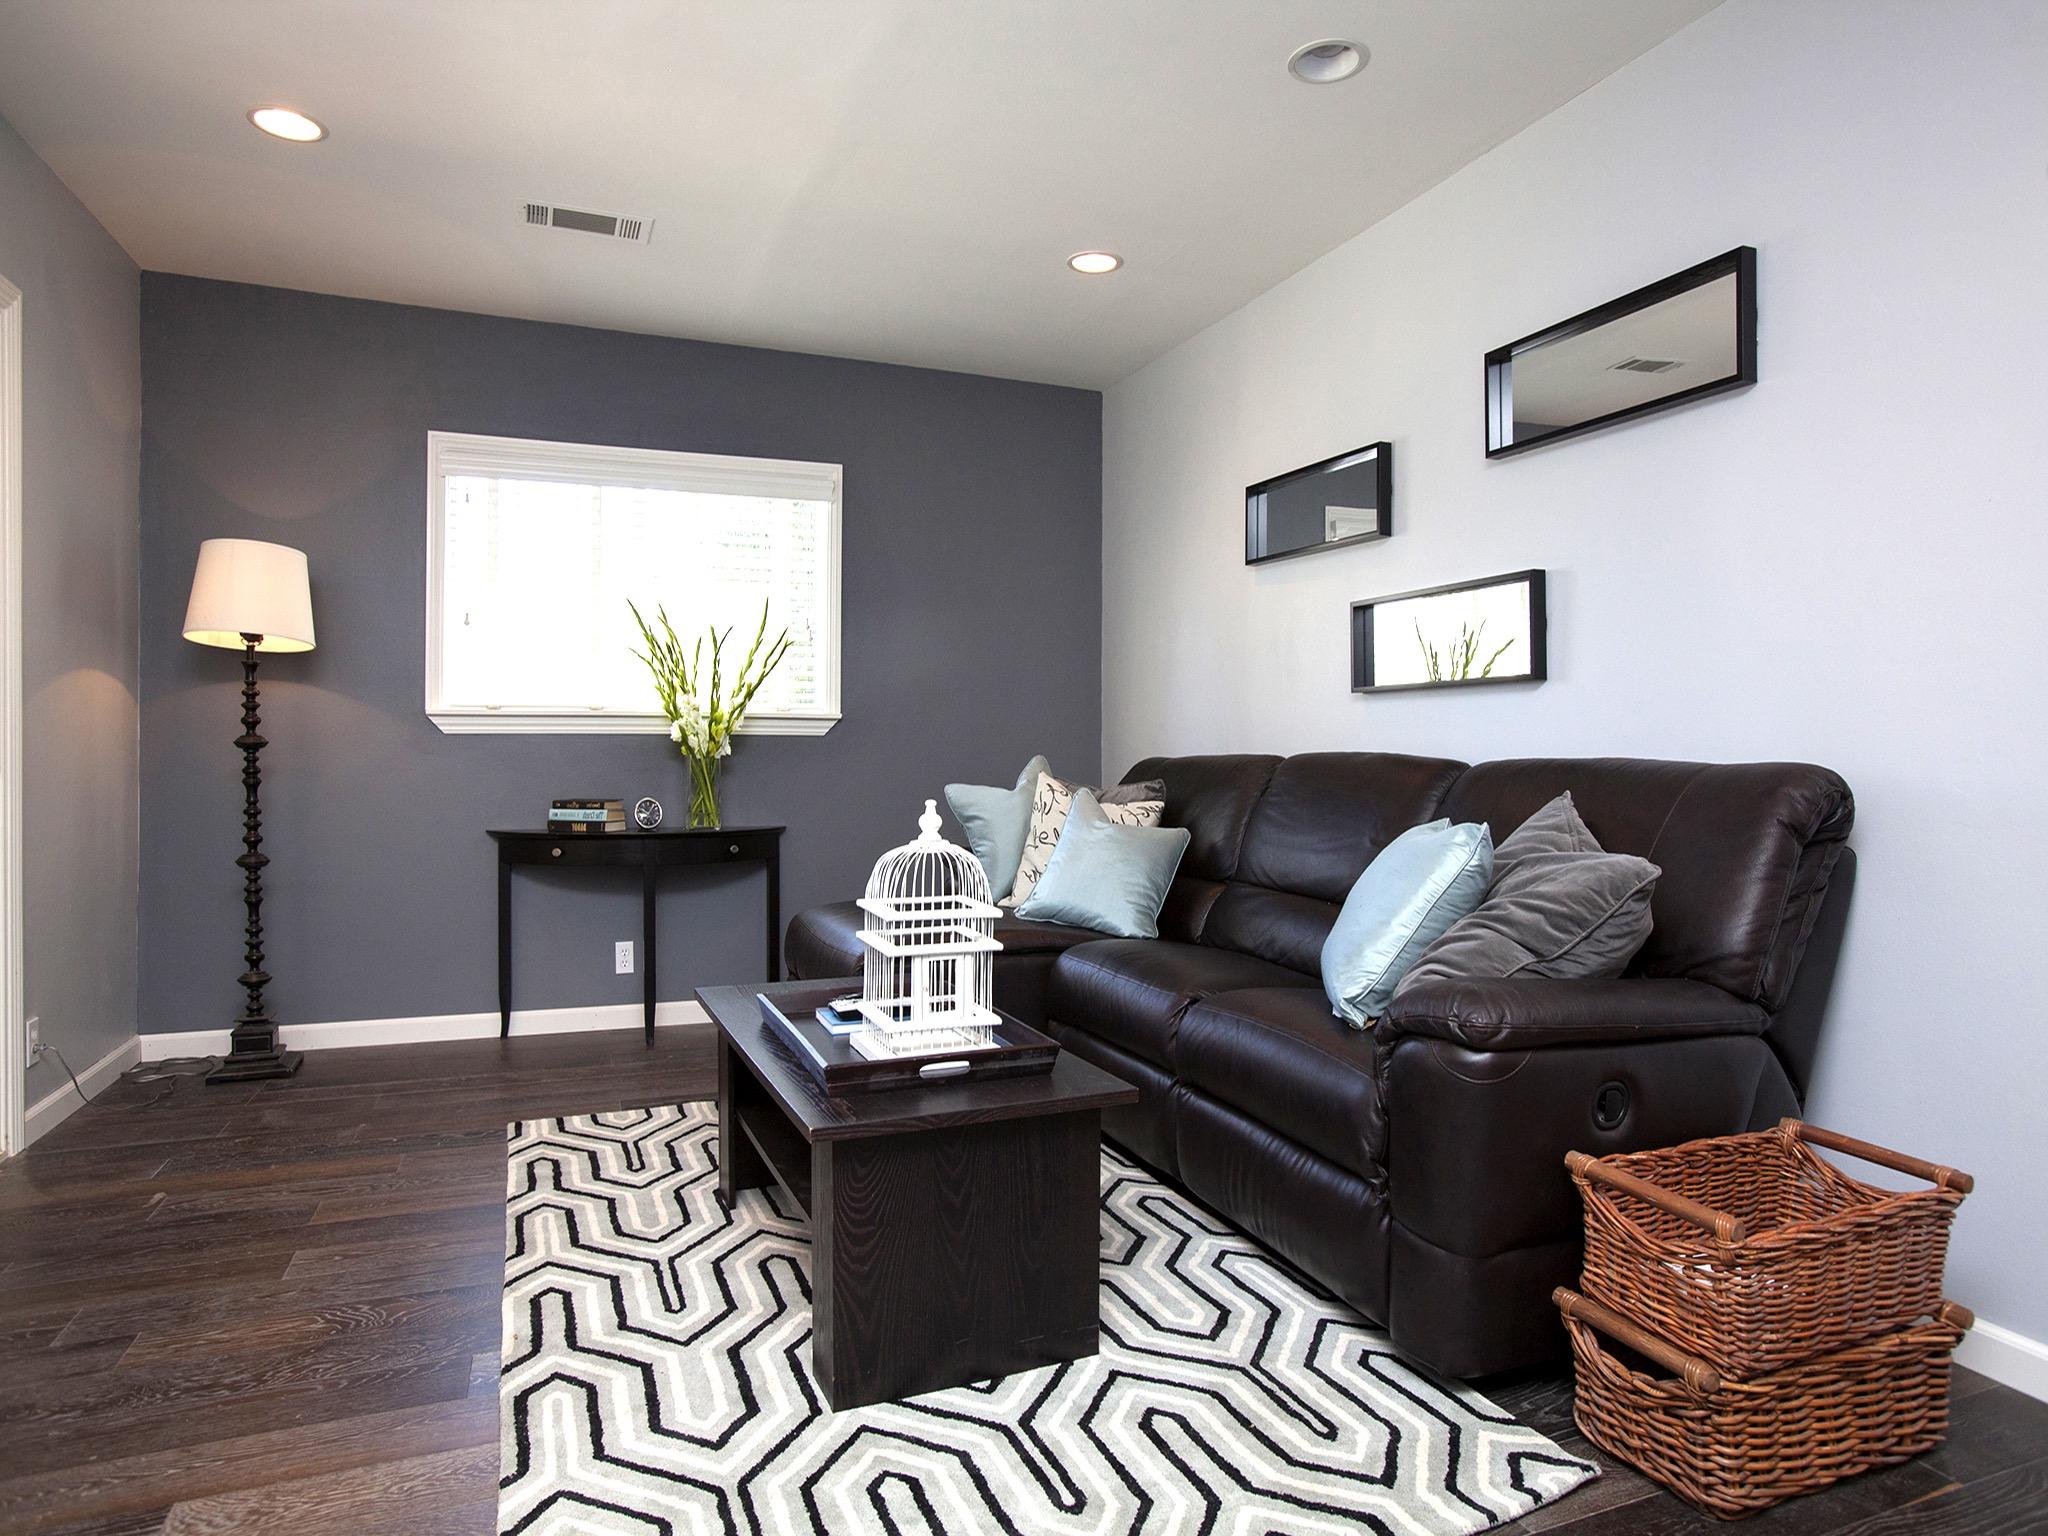 Smart Decoration For Narrow Living Room Interior 15430  Living Room Ideas